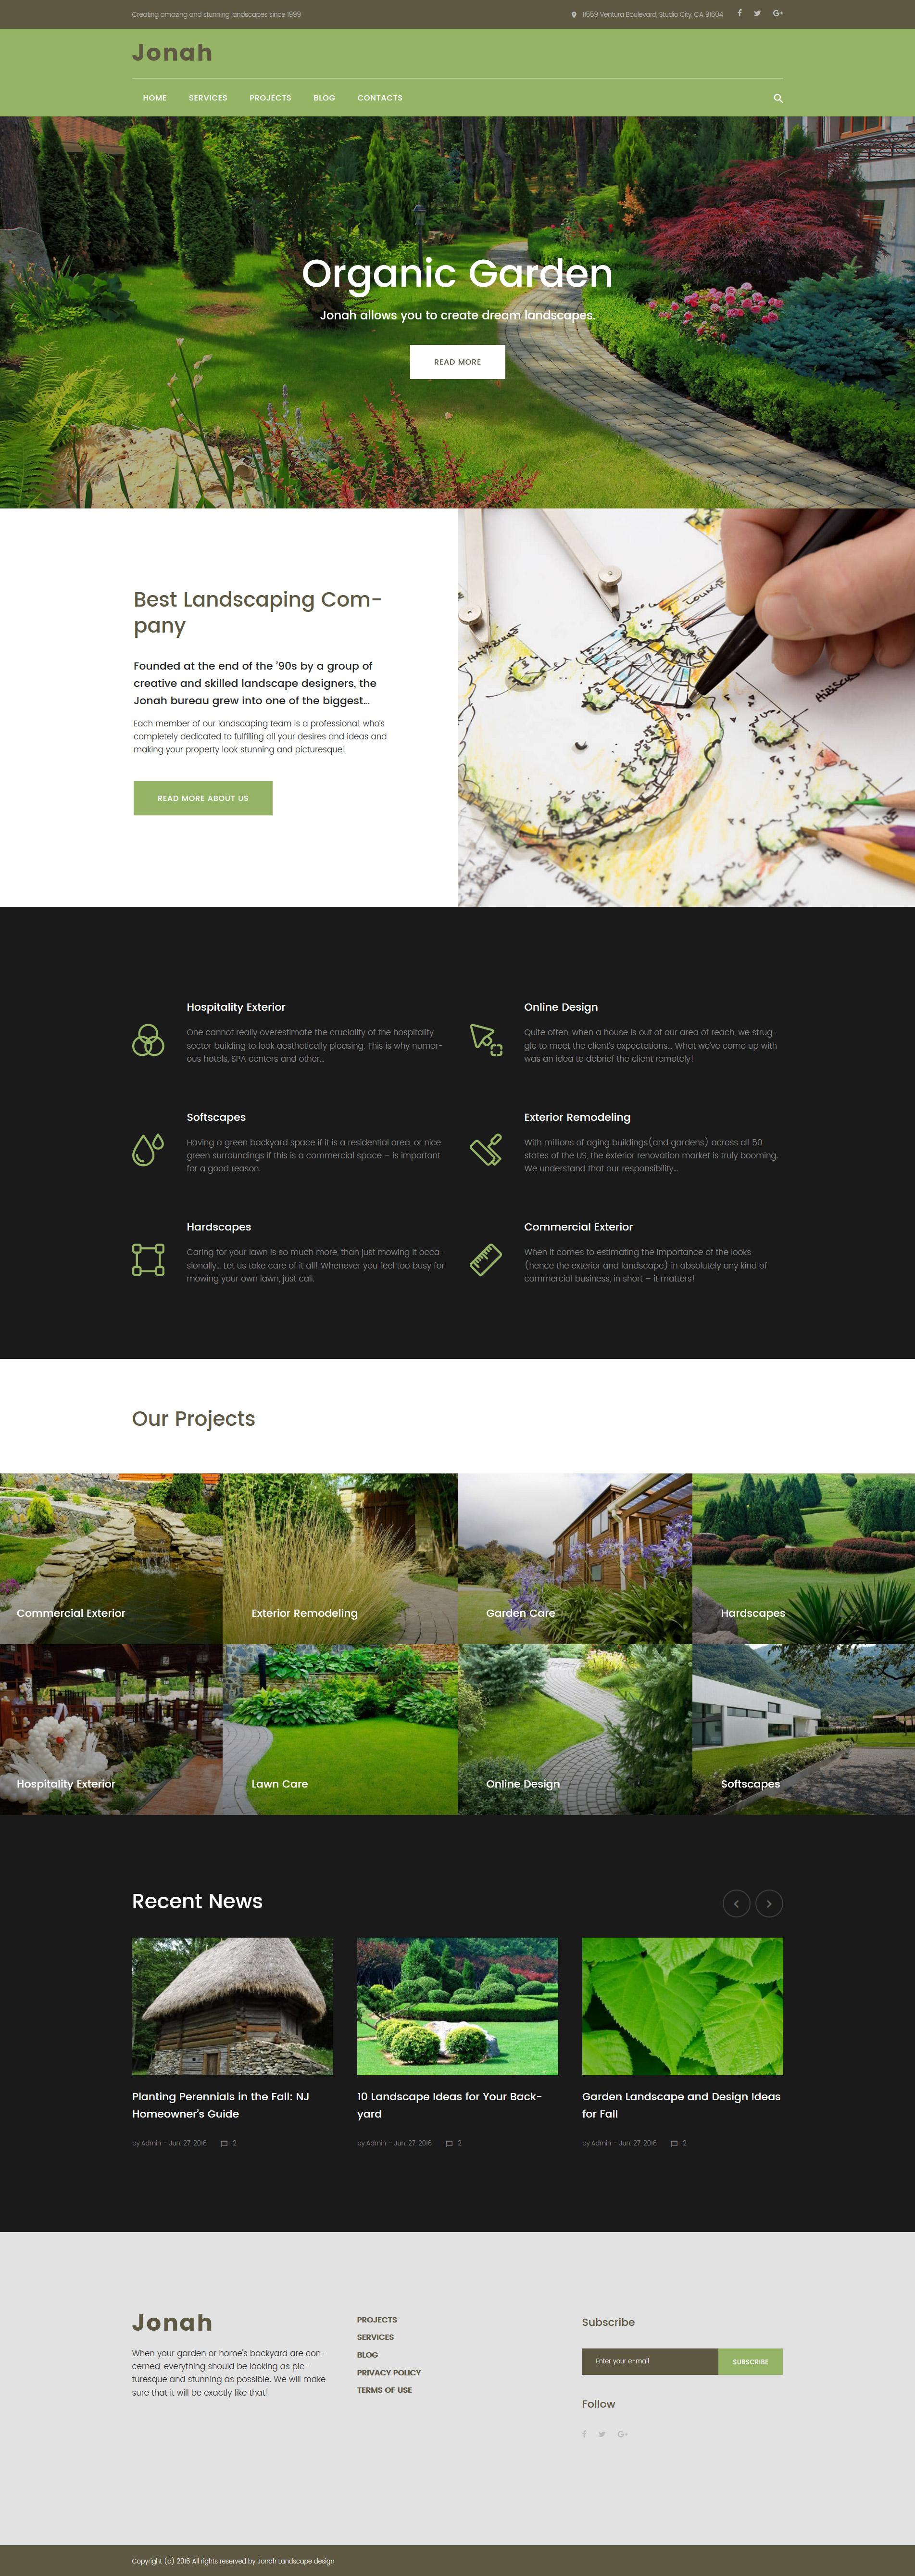 """Jonah - Landscape Design and Lawn Mowing"" - адаптивний WordPress шаблон №61319"